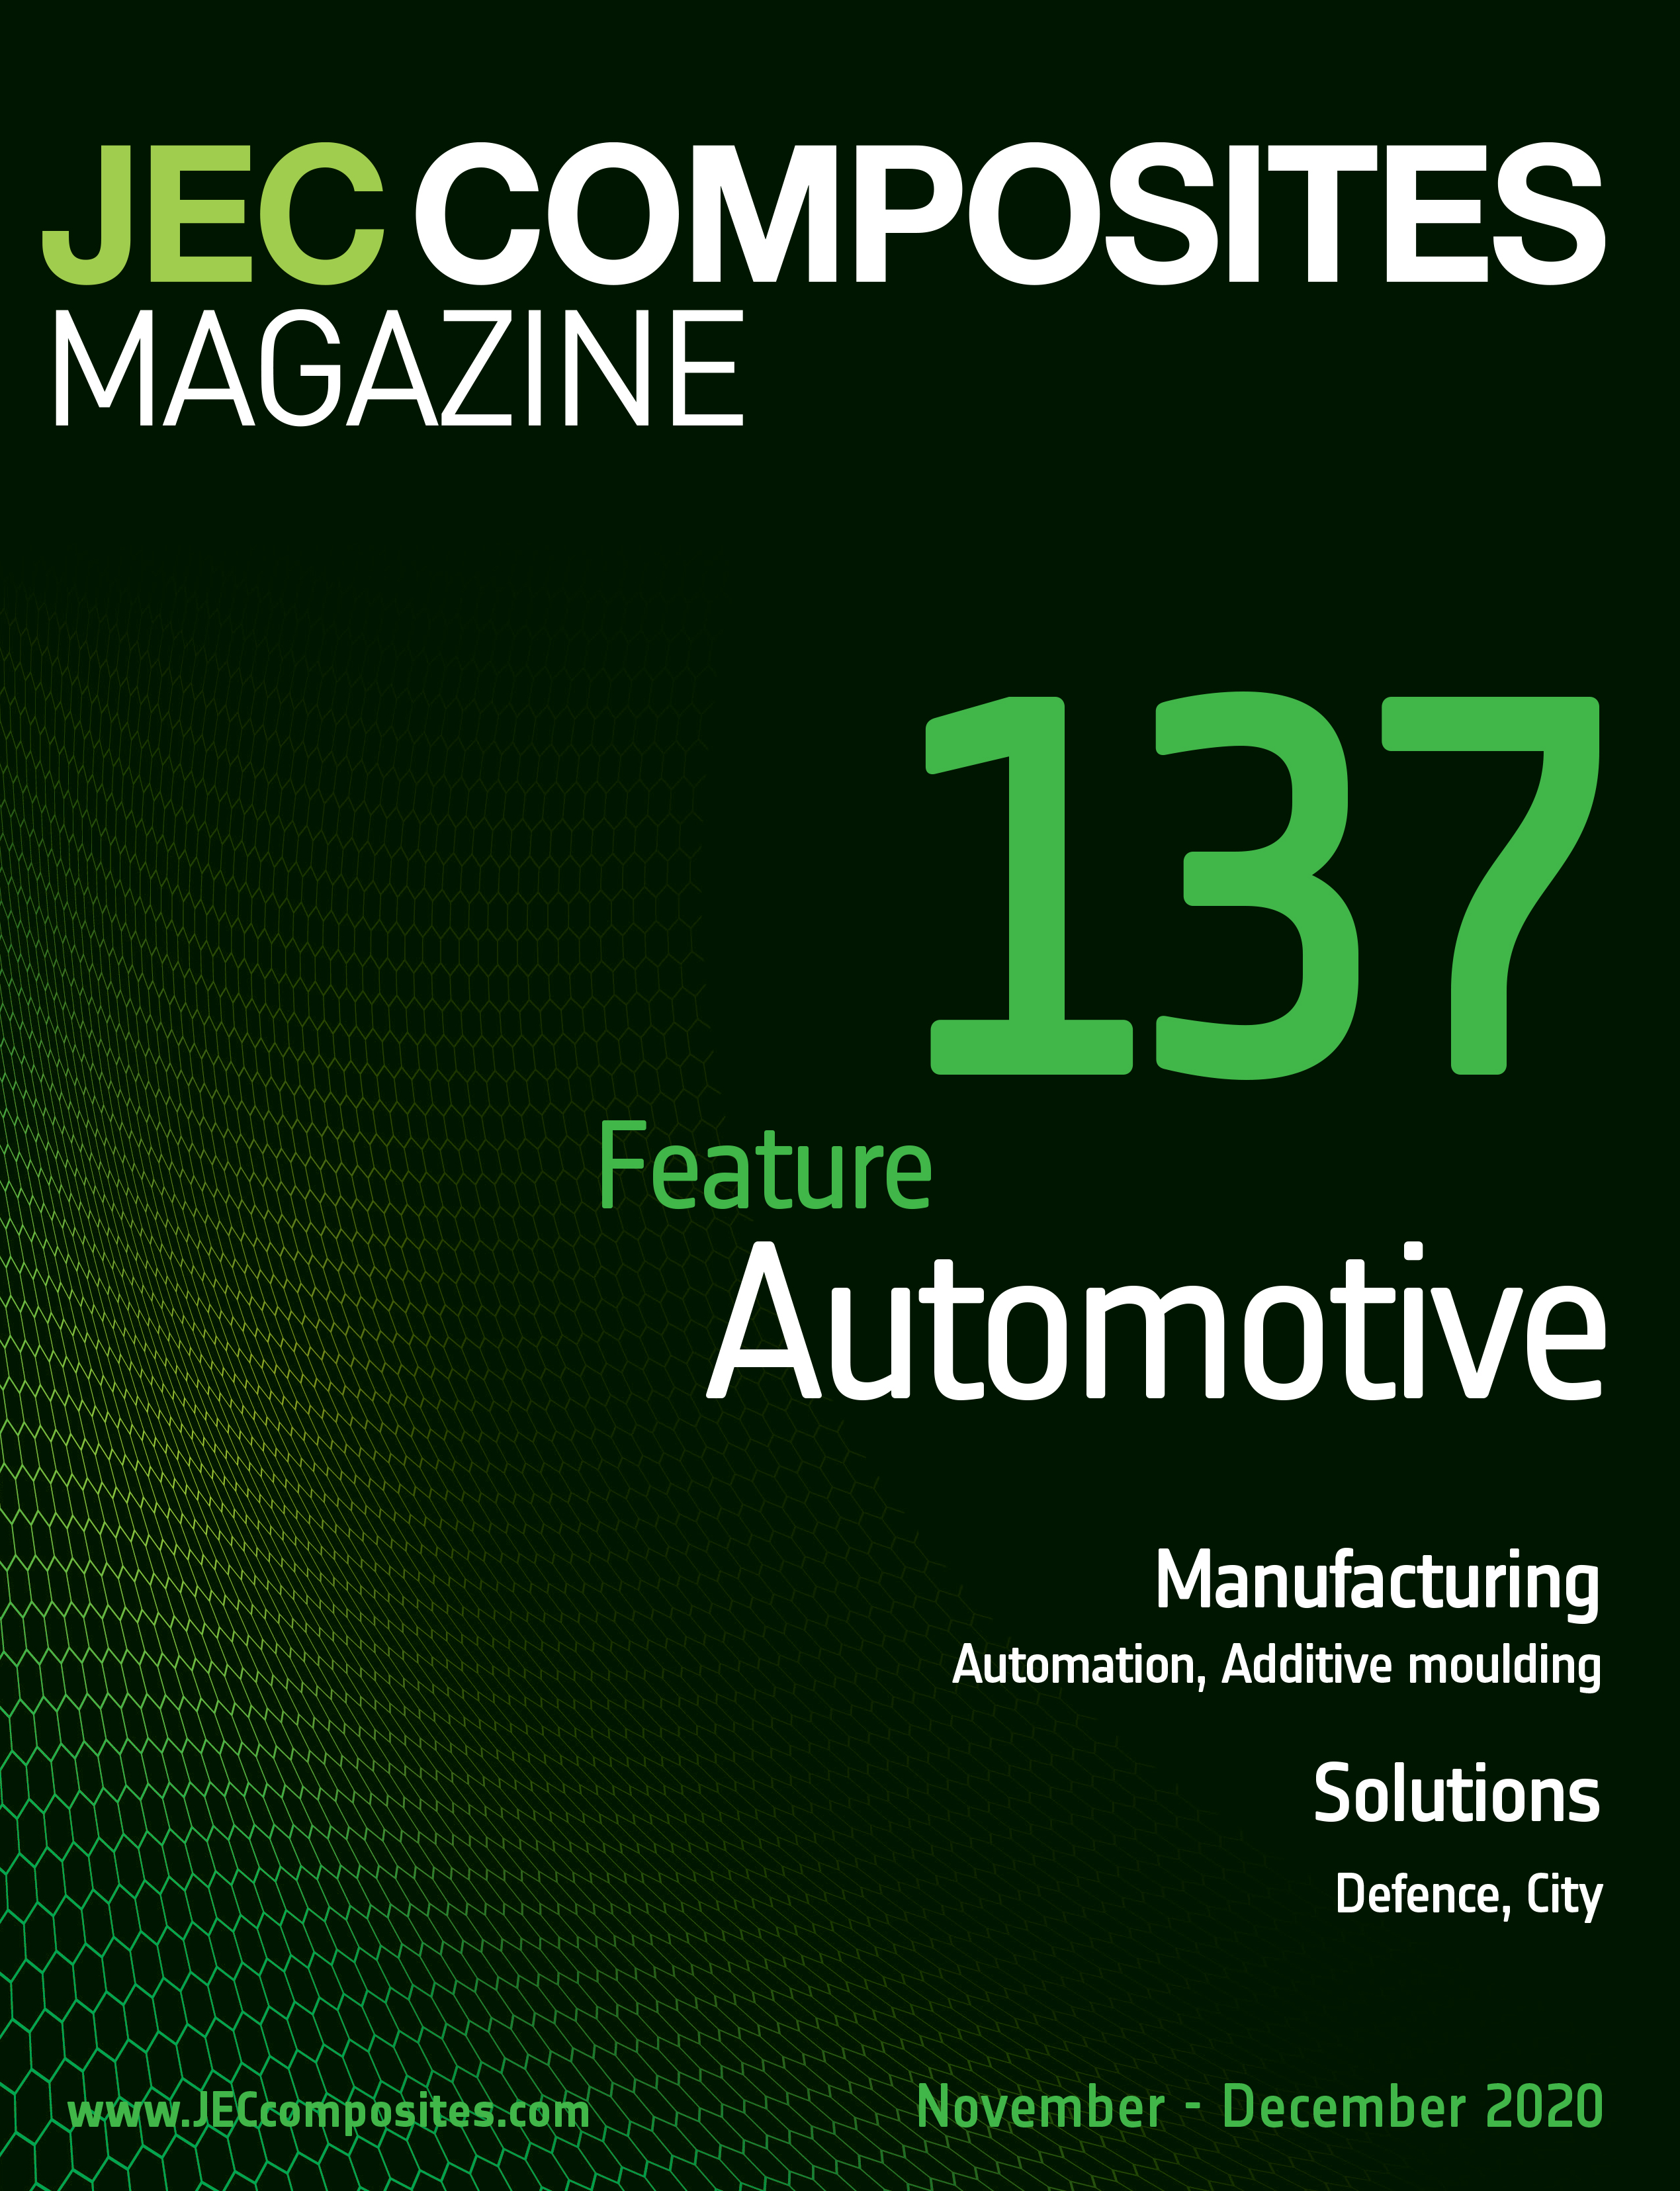 JEC Composites Magazine N°137, featuring Automotive